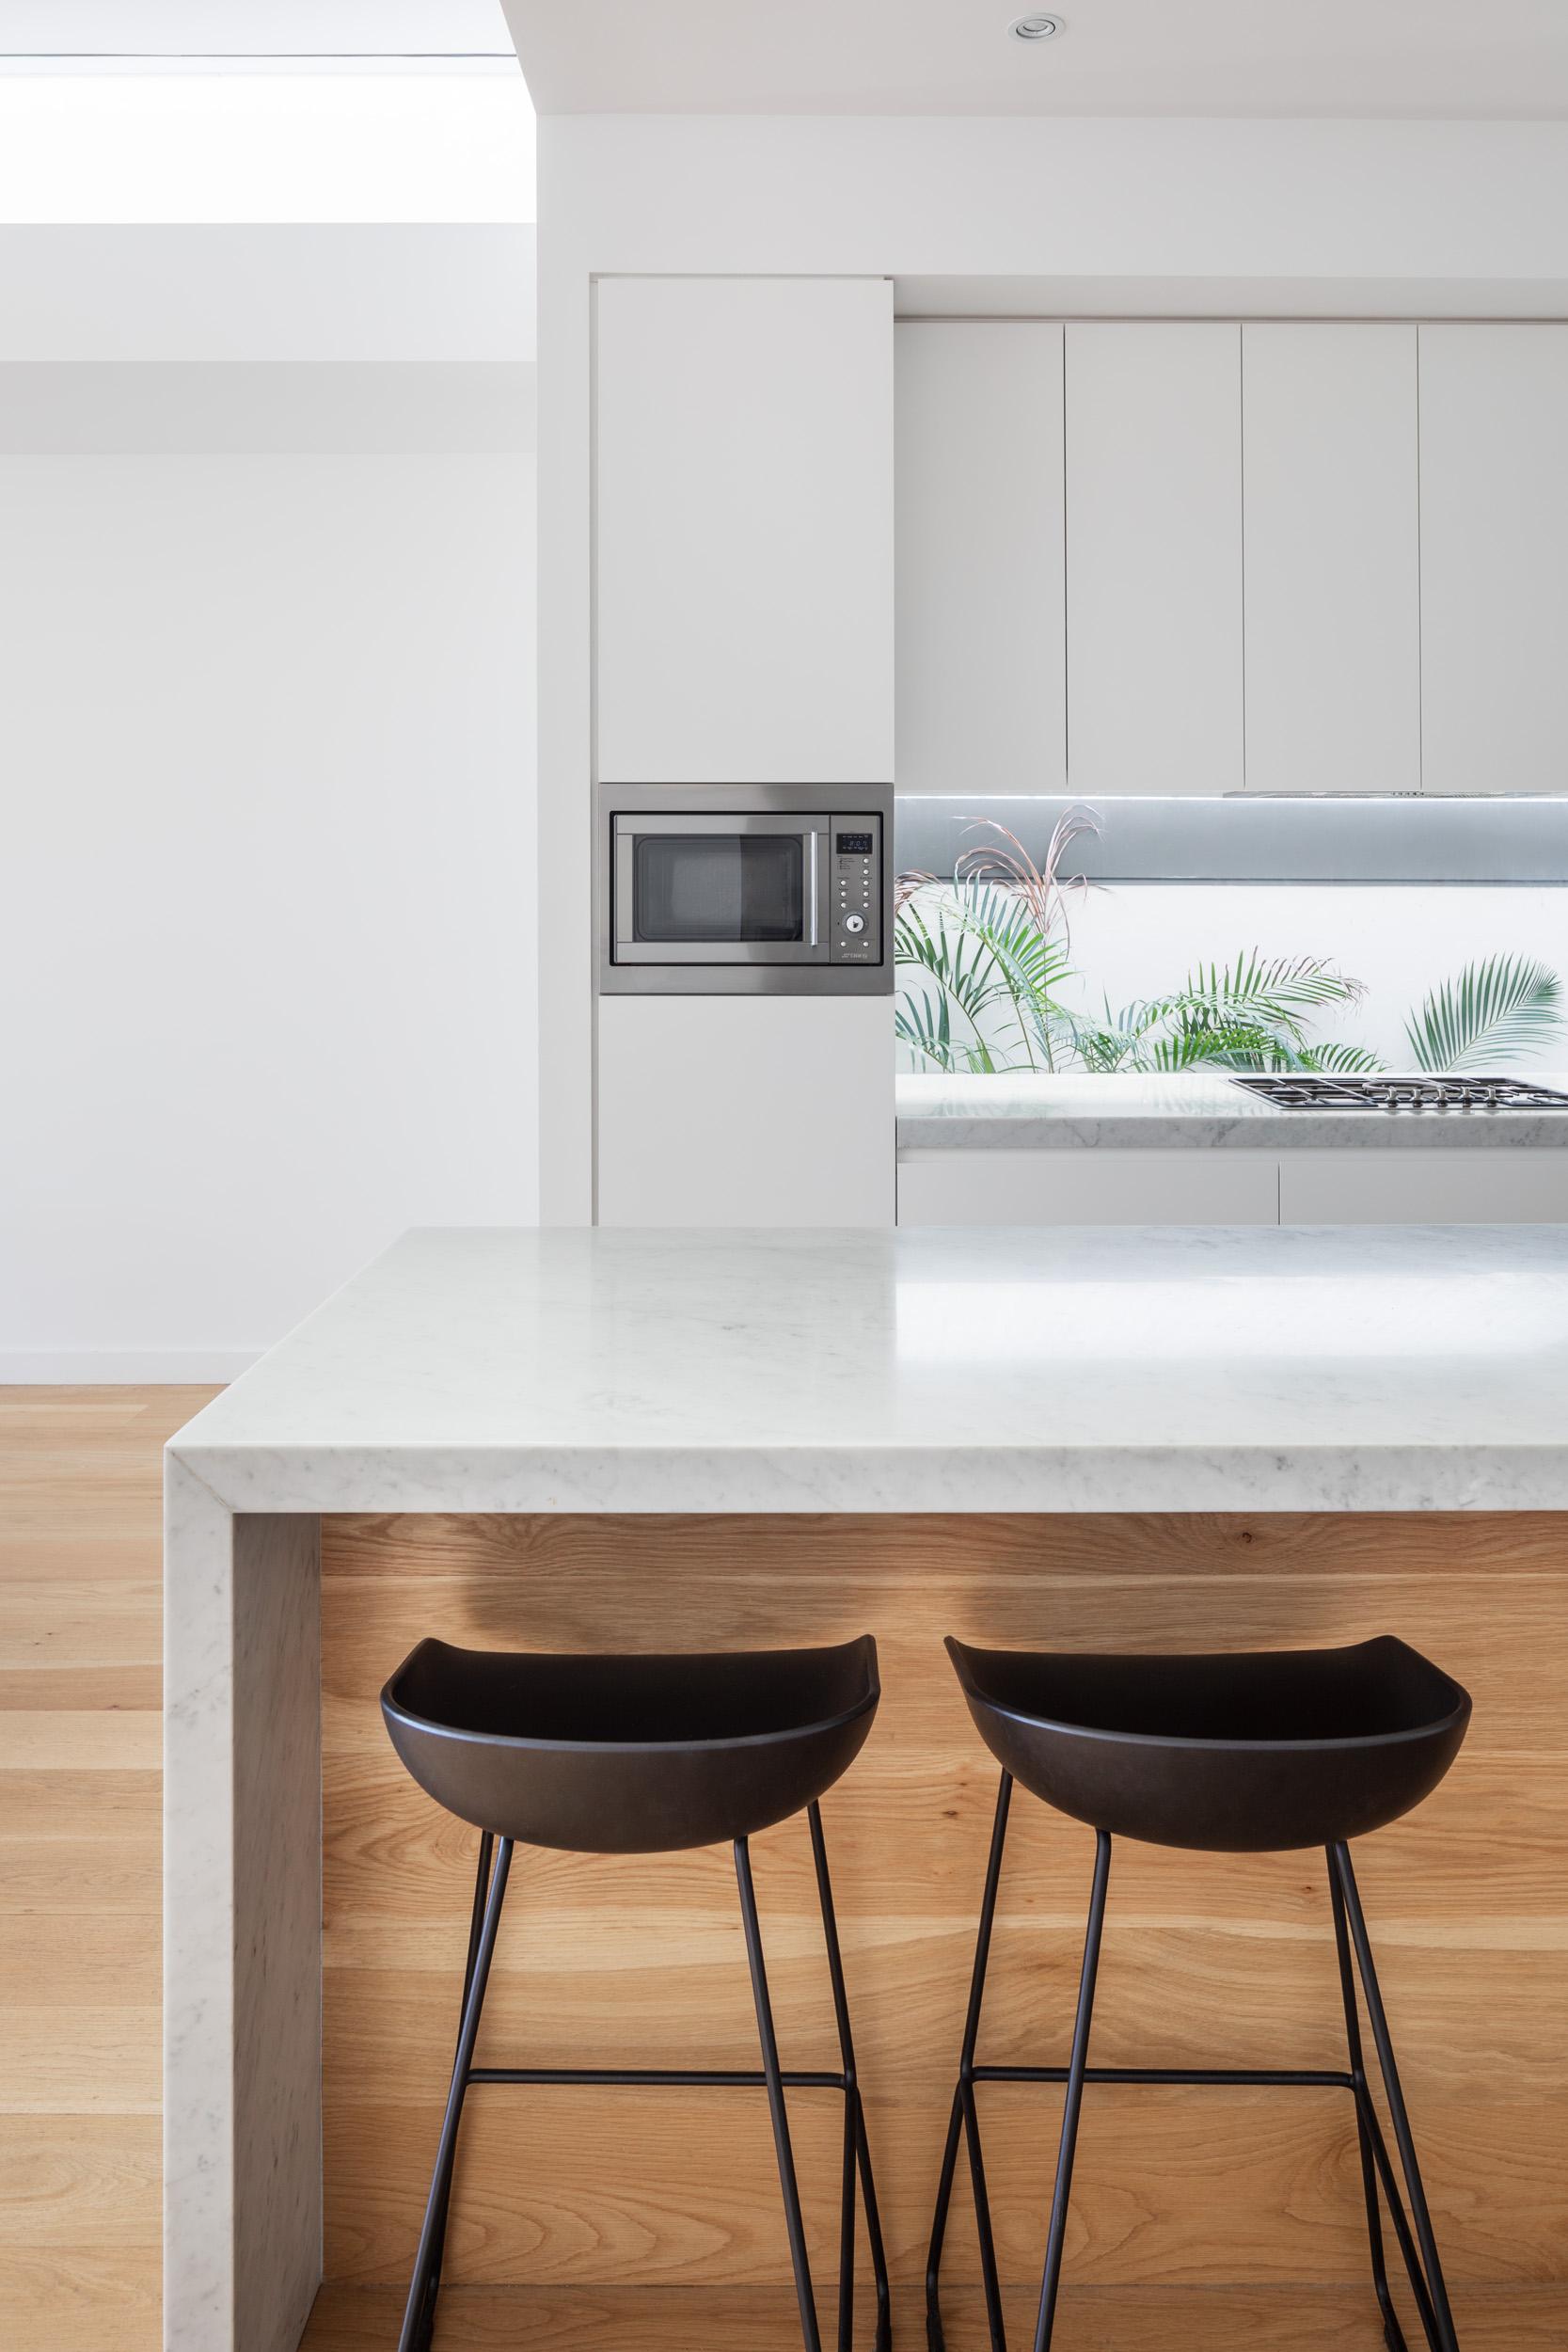 Jem_Cresswell_Architecture_Residential_Photographer_Sydney_Australia_019.jpg